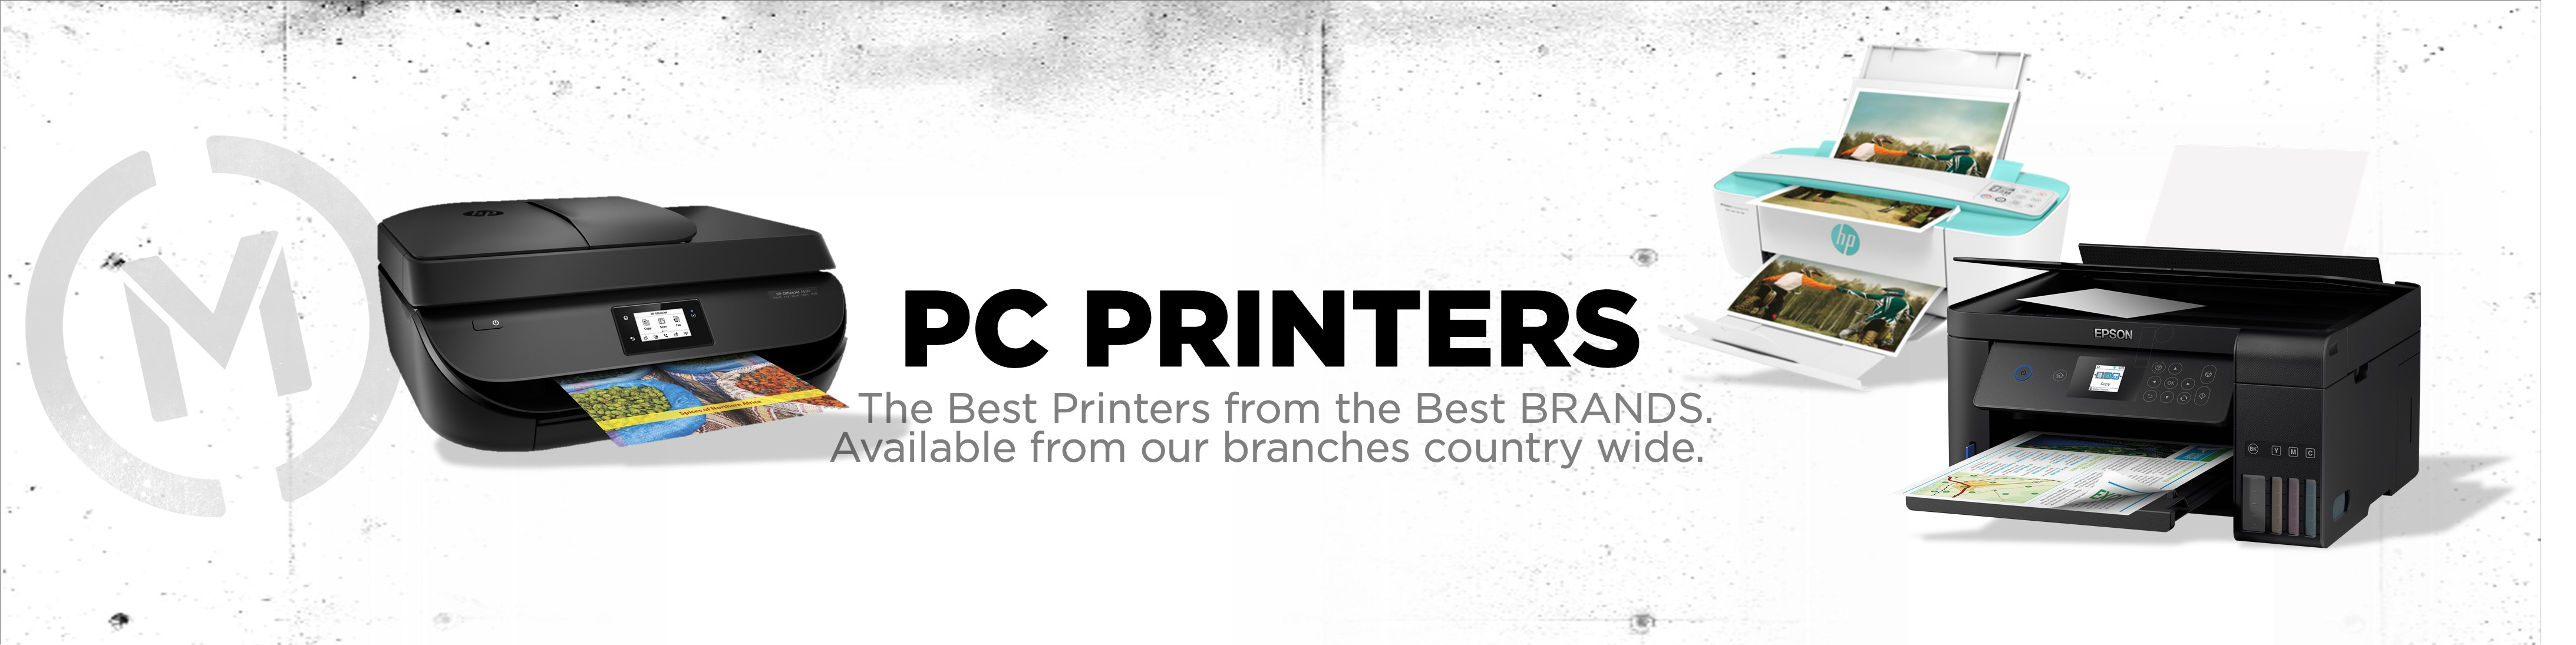 Matrix PC Printers Banner